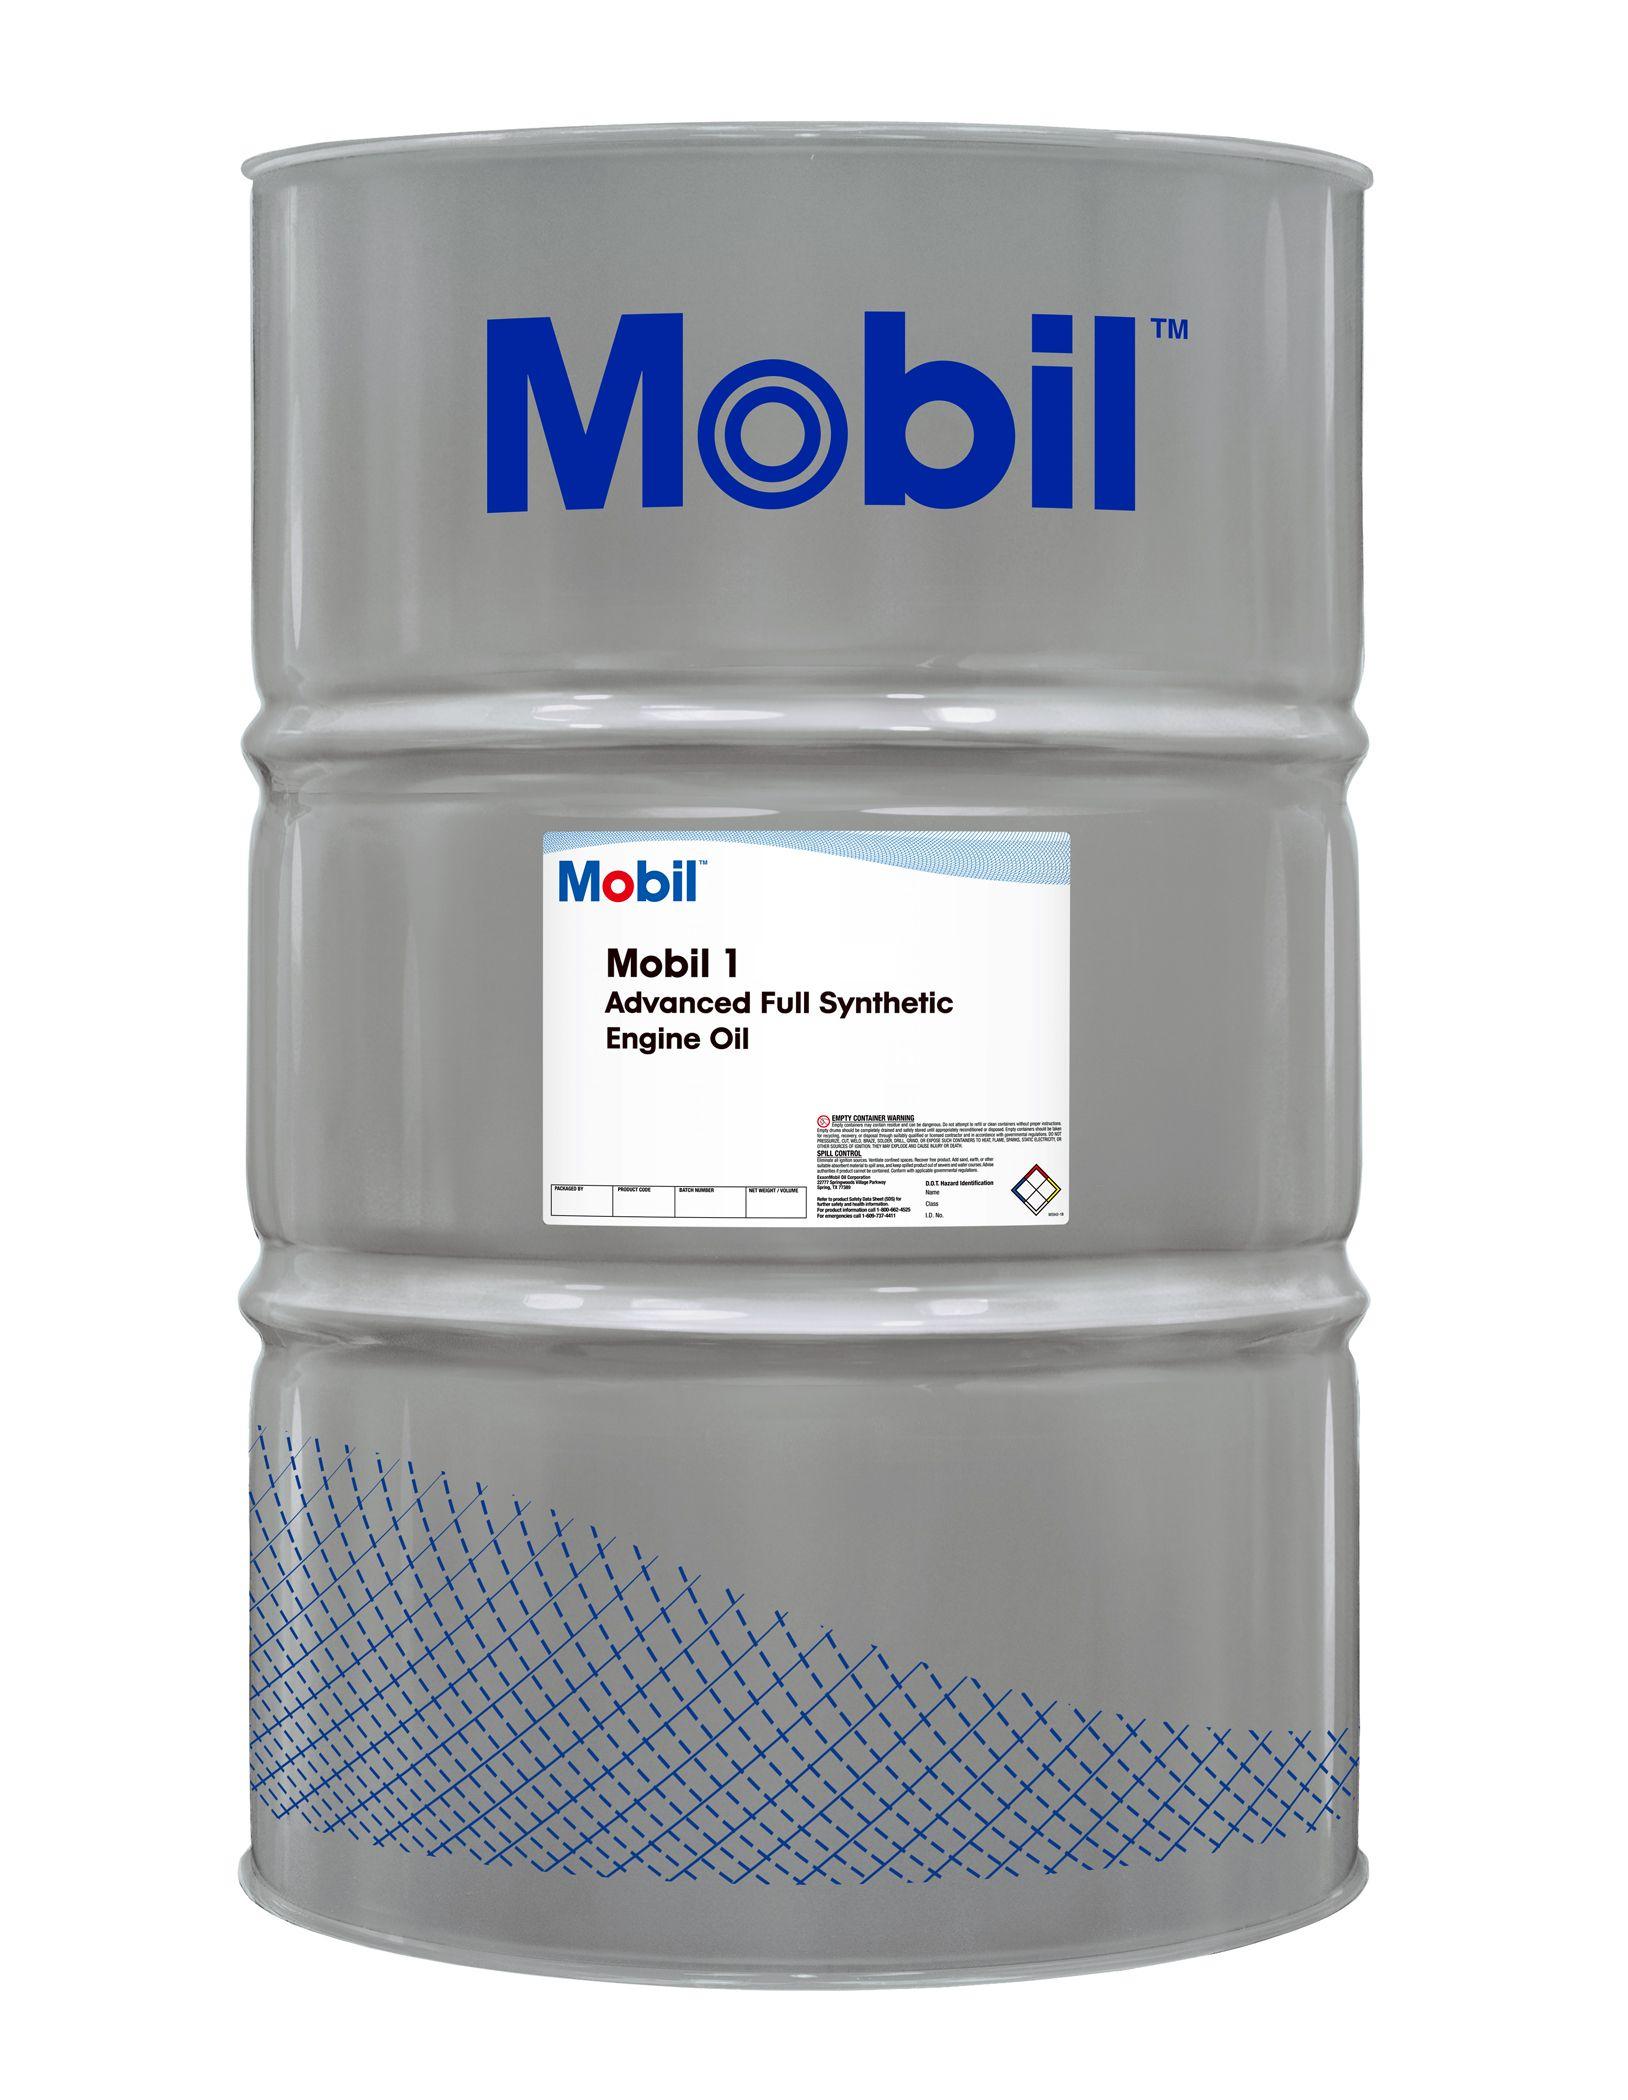 Mobil 1 Advanced Motor Oil 55 Gallon Drum 0w 20 0w 40 5w20 5w 30 Bg Wholesale Oil Change 55 Gallon Drum Drums